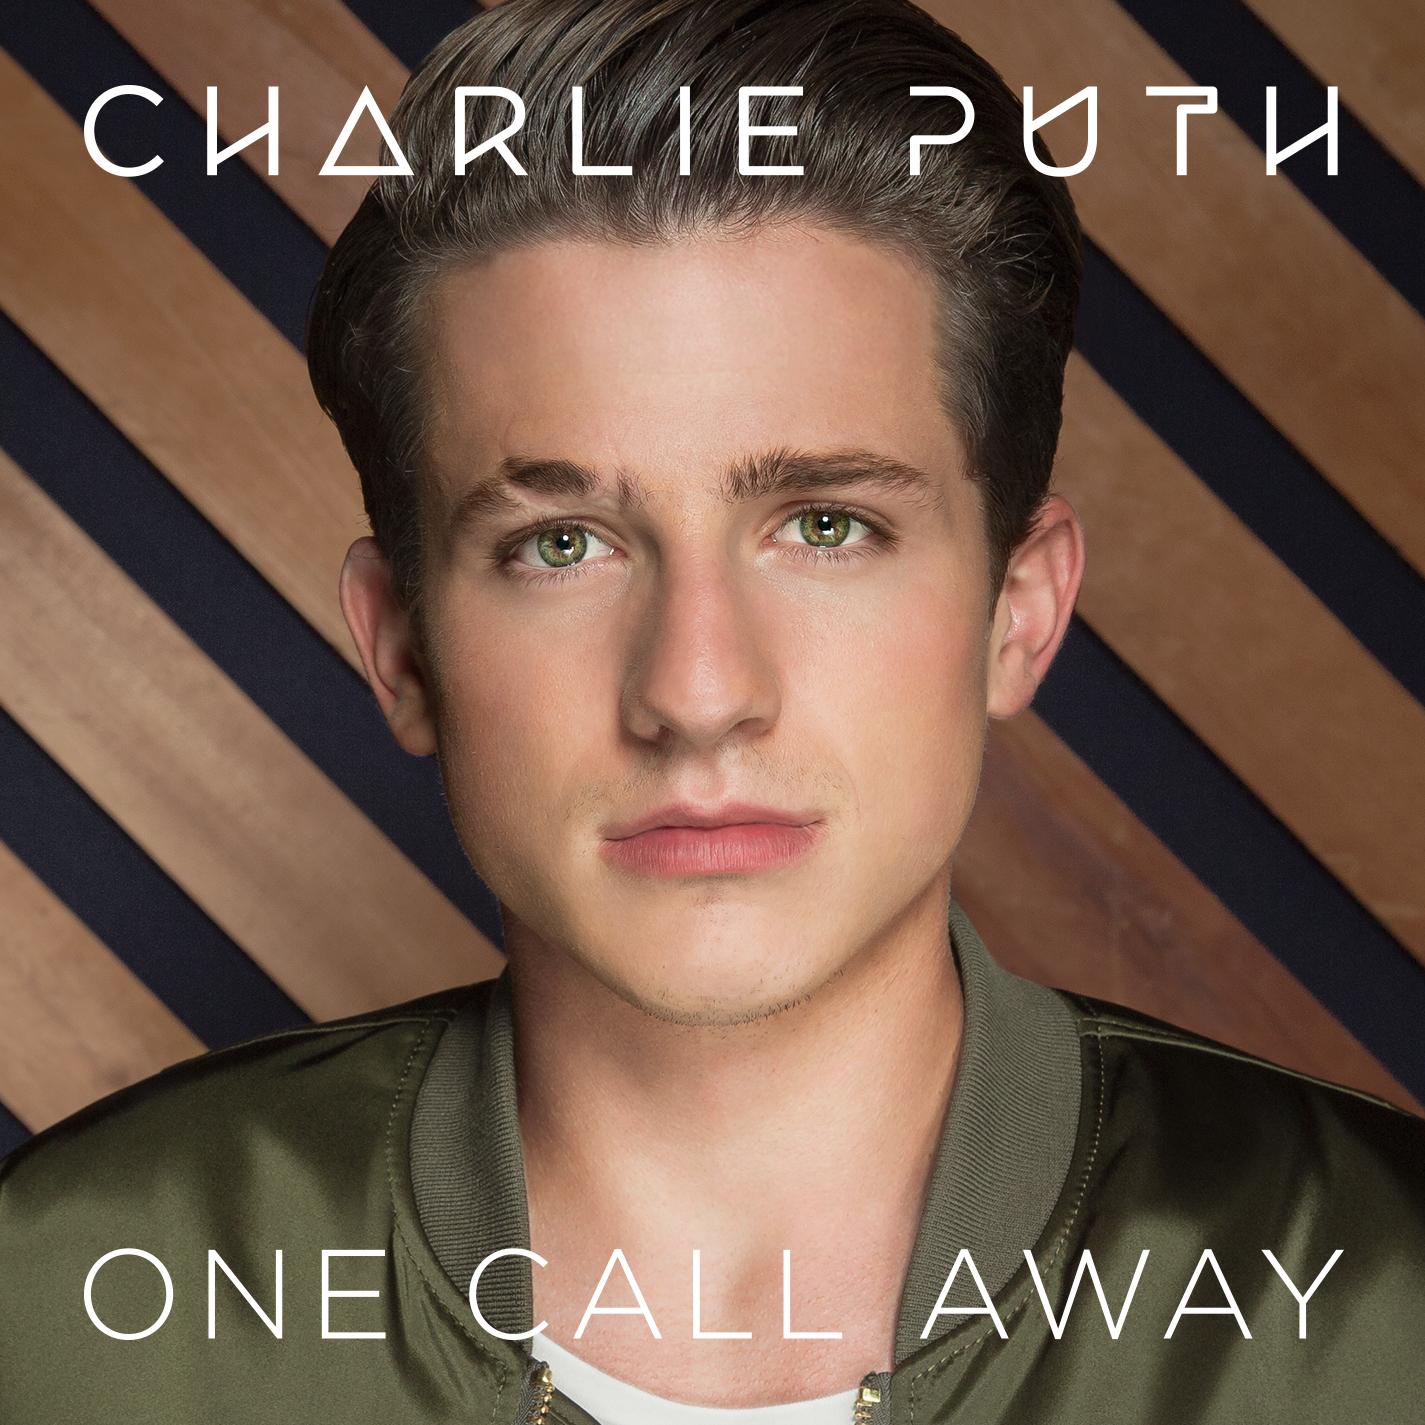 charlie-puth-one-call-away.jpg